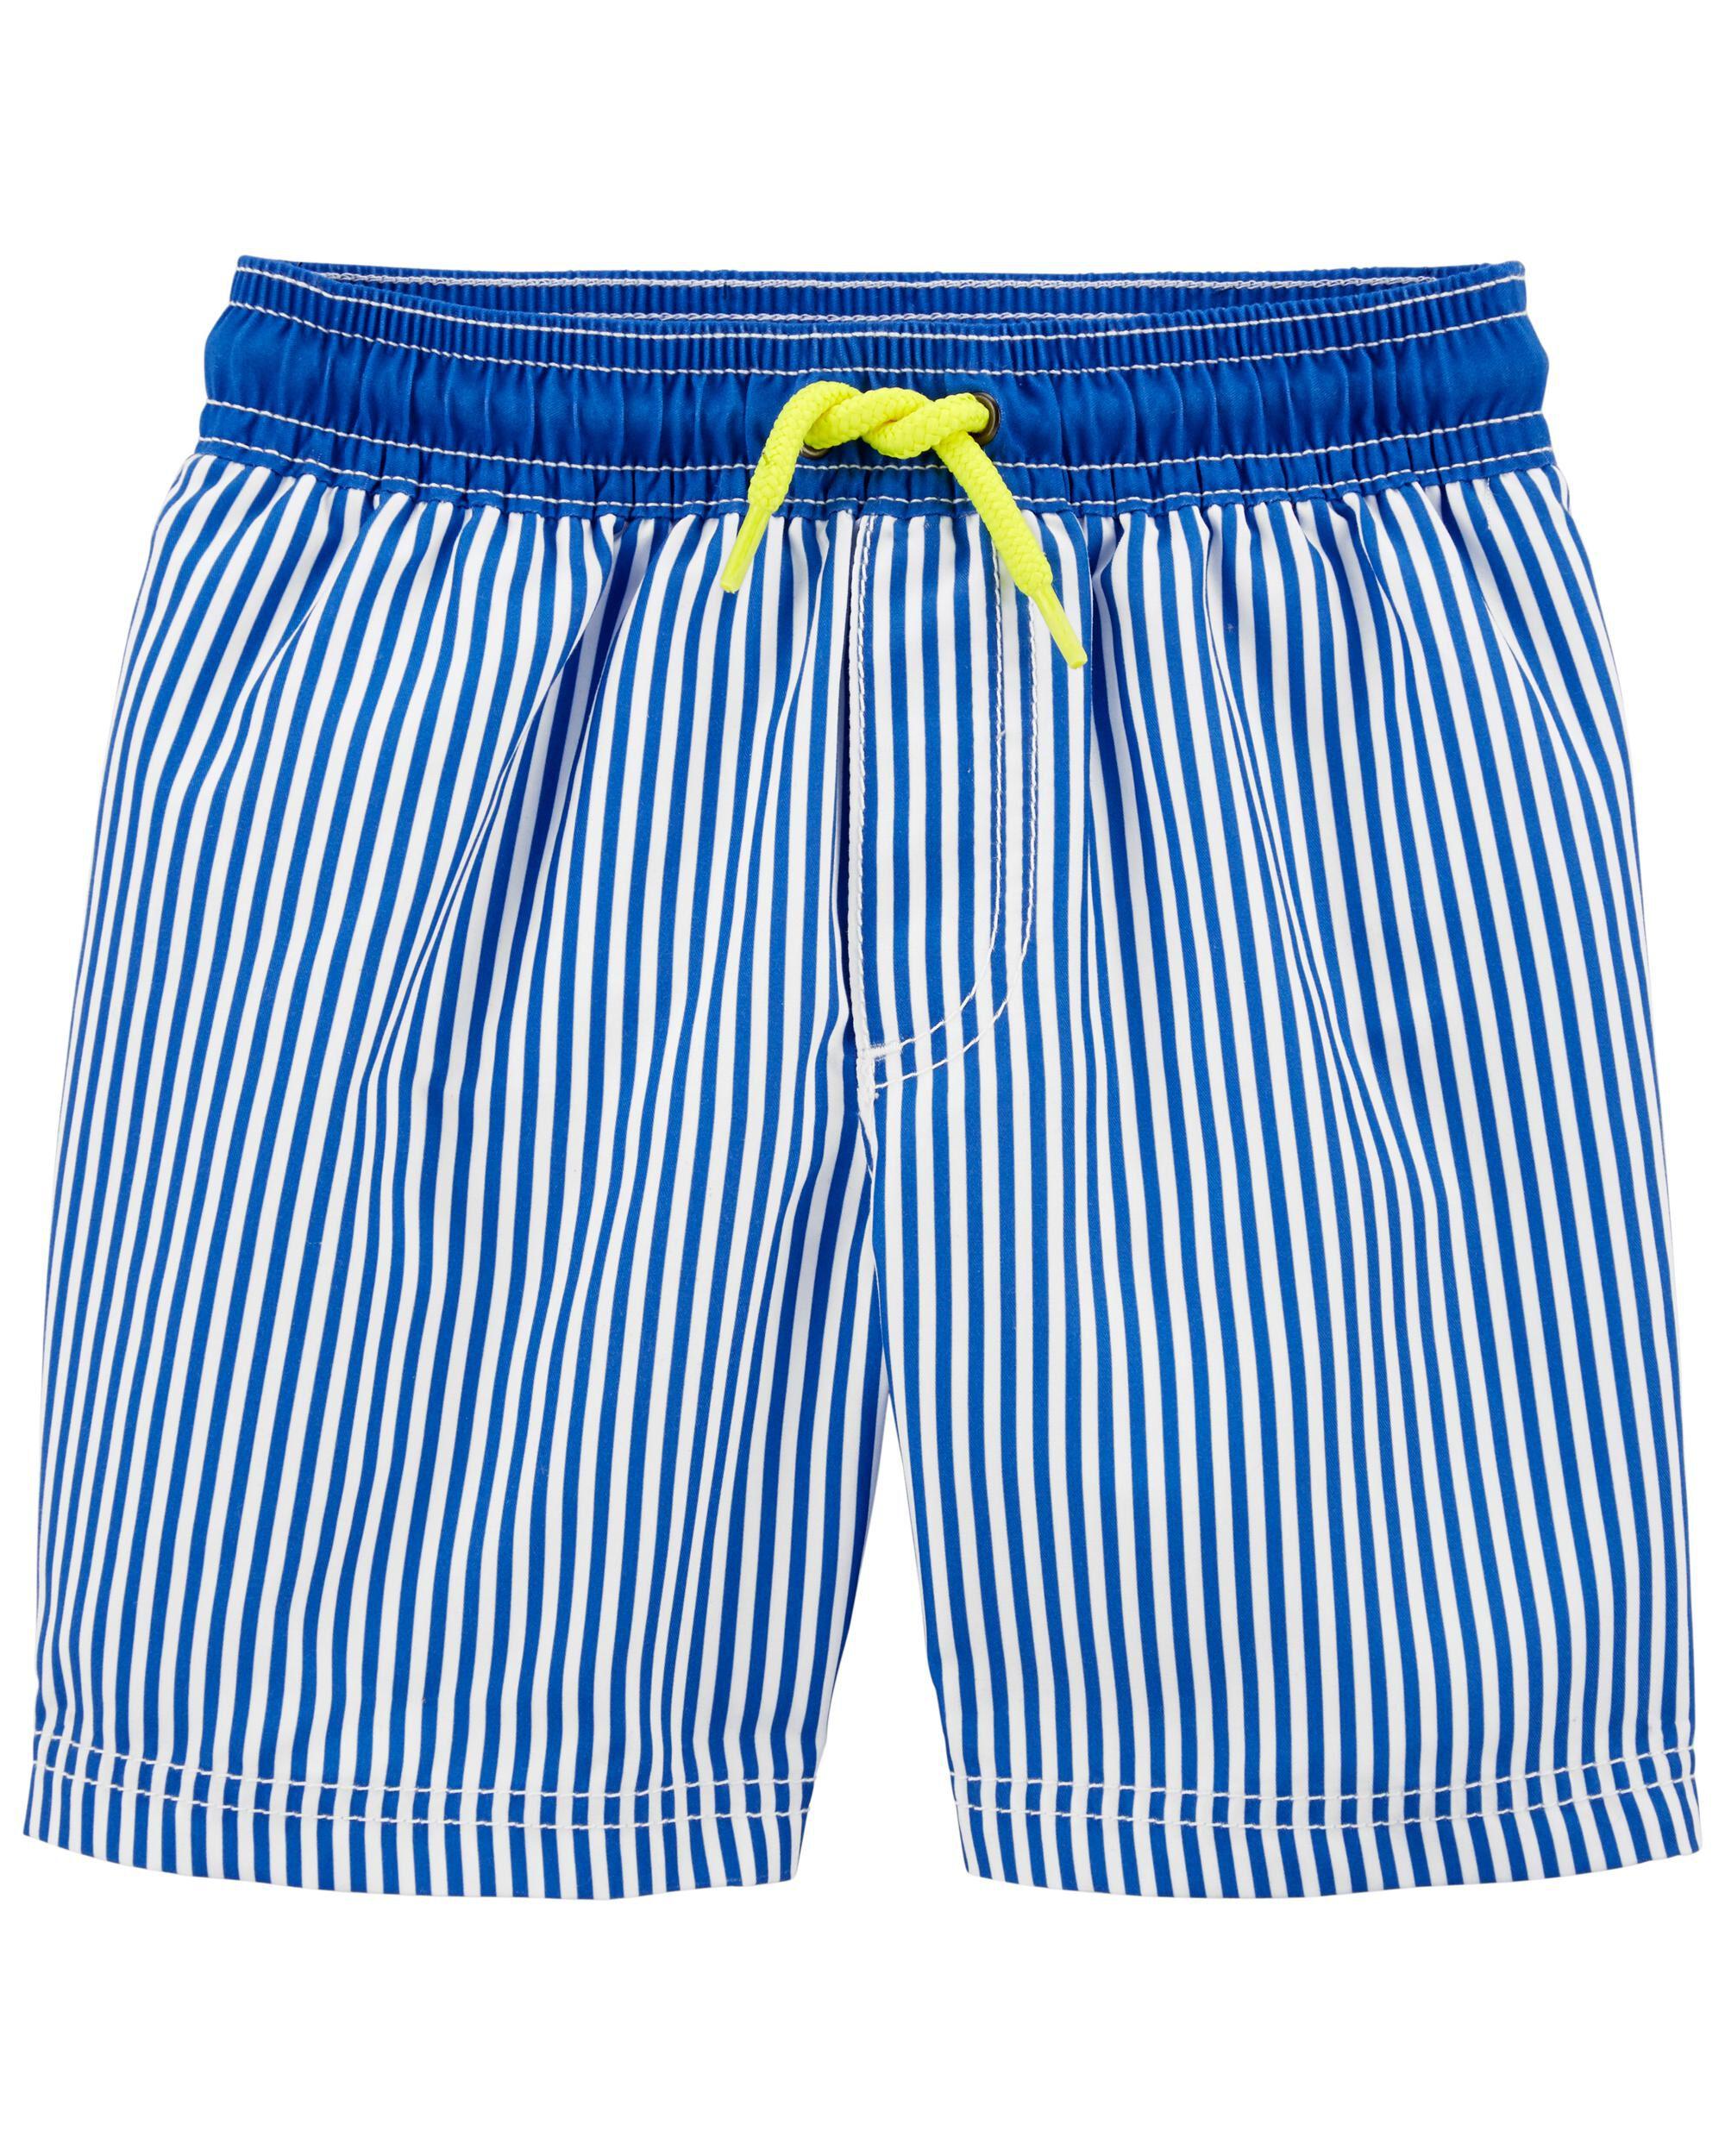 Carters Striped Swim Trunks